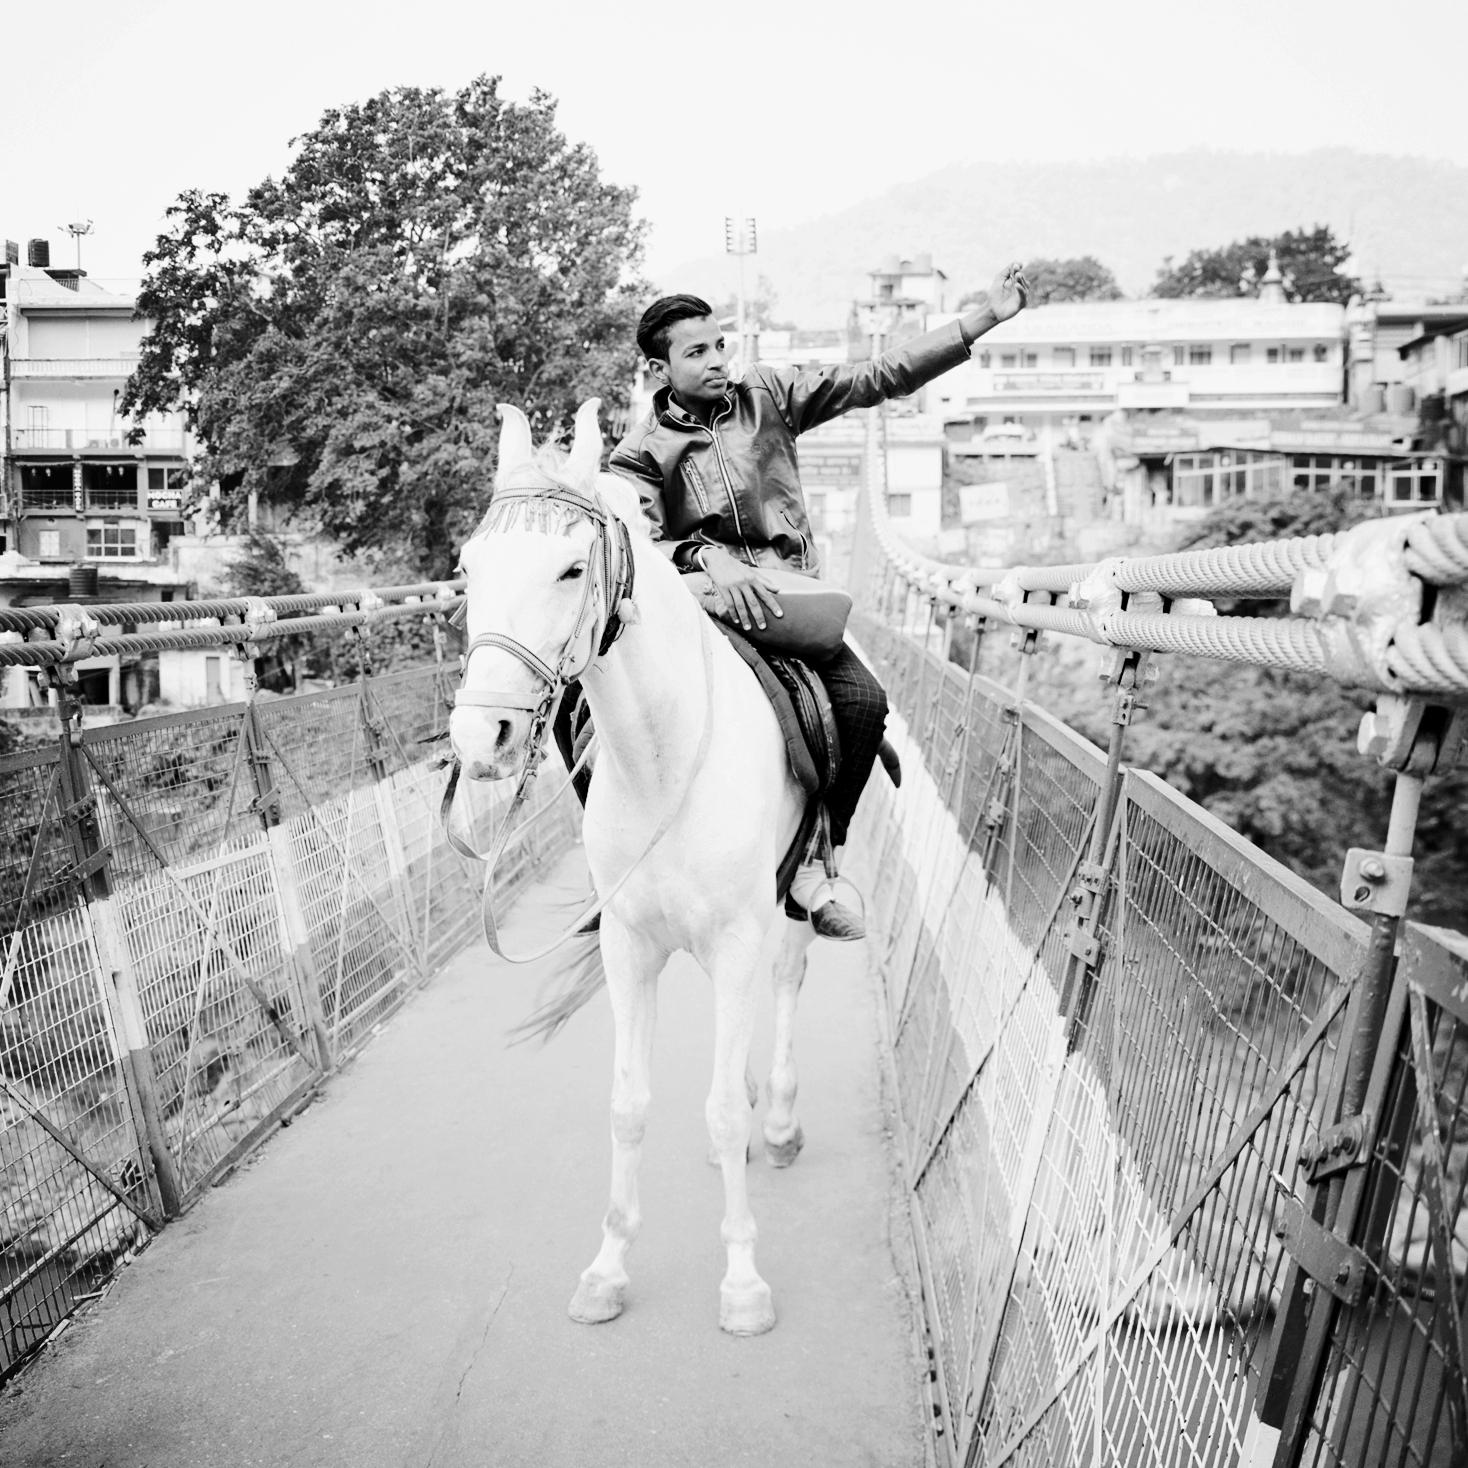 India - COMING SOON! Photographs created across India in Delhi, Mumbai, Rishikesh, Shillong, and Kolkata.